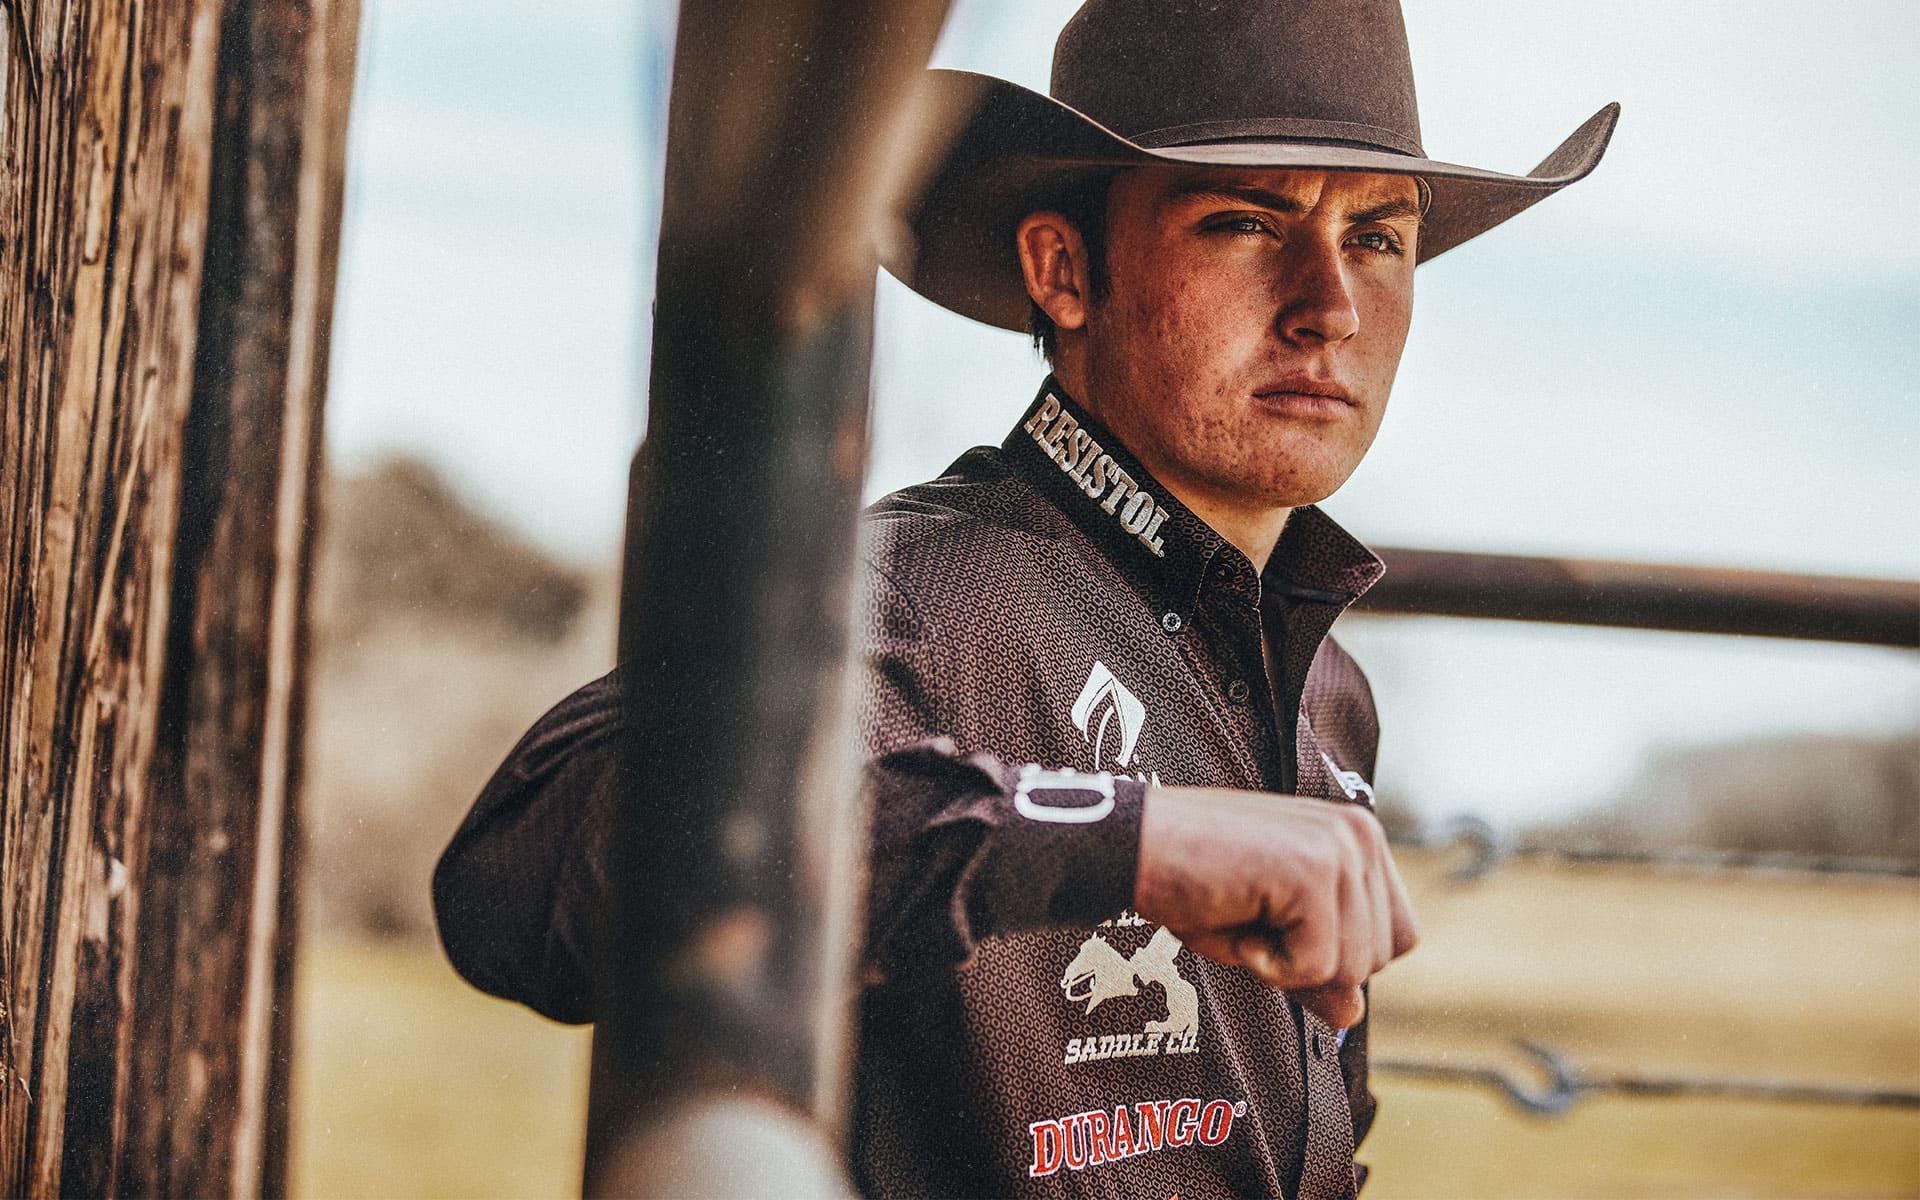 Riley Webb - Professional Tie-Down Roper on Team Durango®